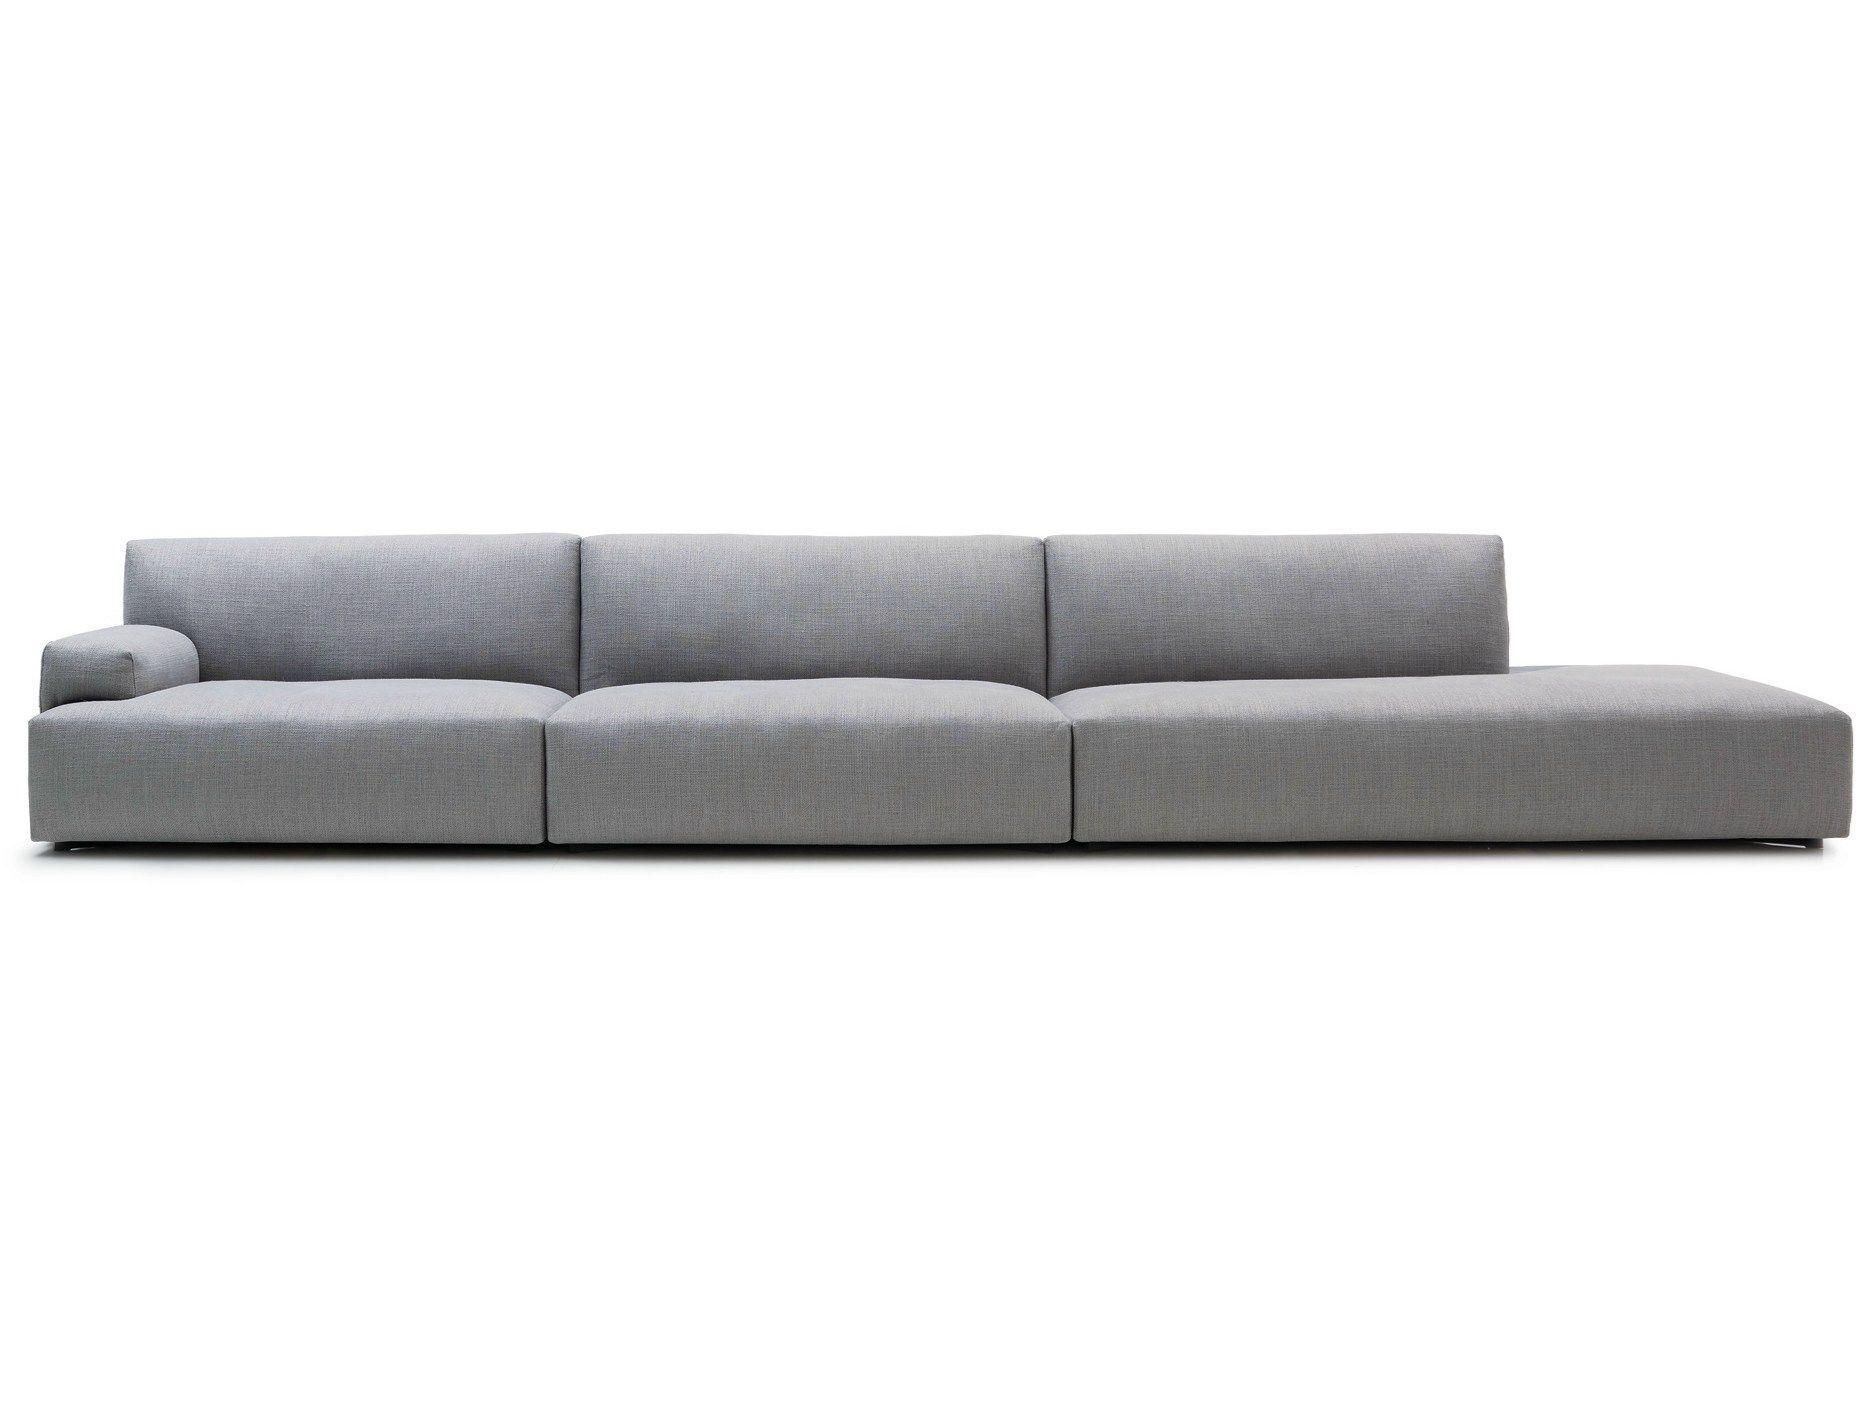 Sectional Fabric Sofa With Removable Cover Soho By Poliform Design Paolo Piva Poliform Sofa Sofa Contemporary Sofa